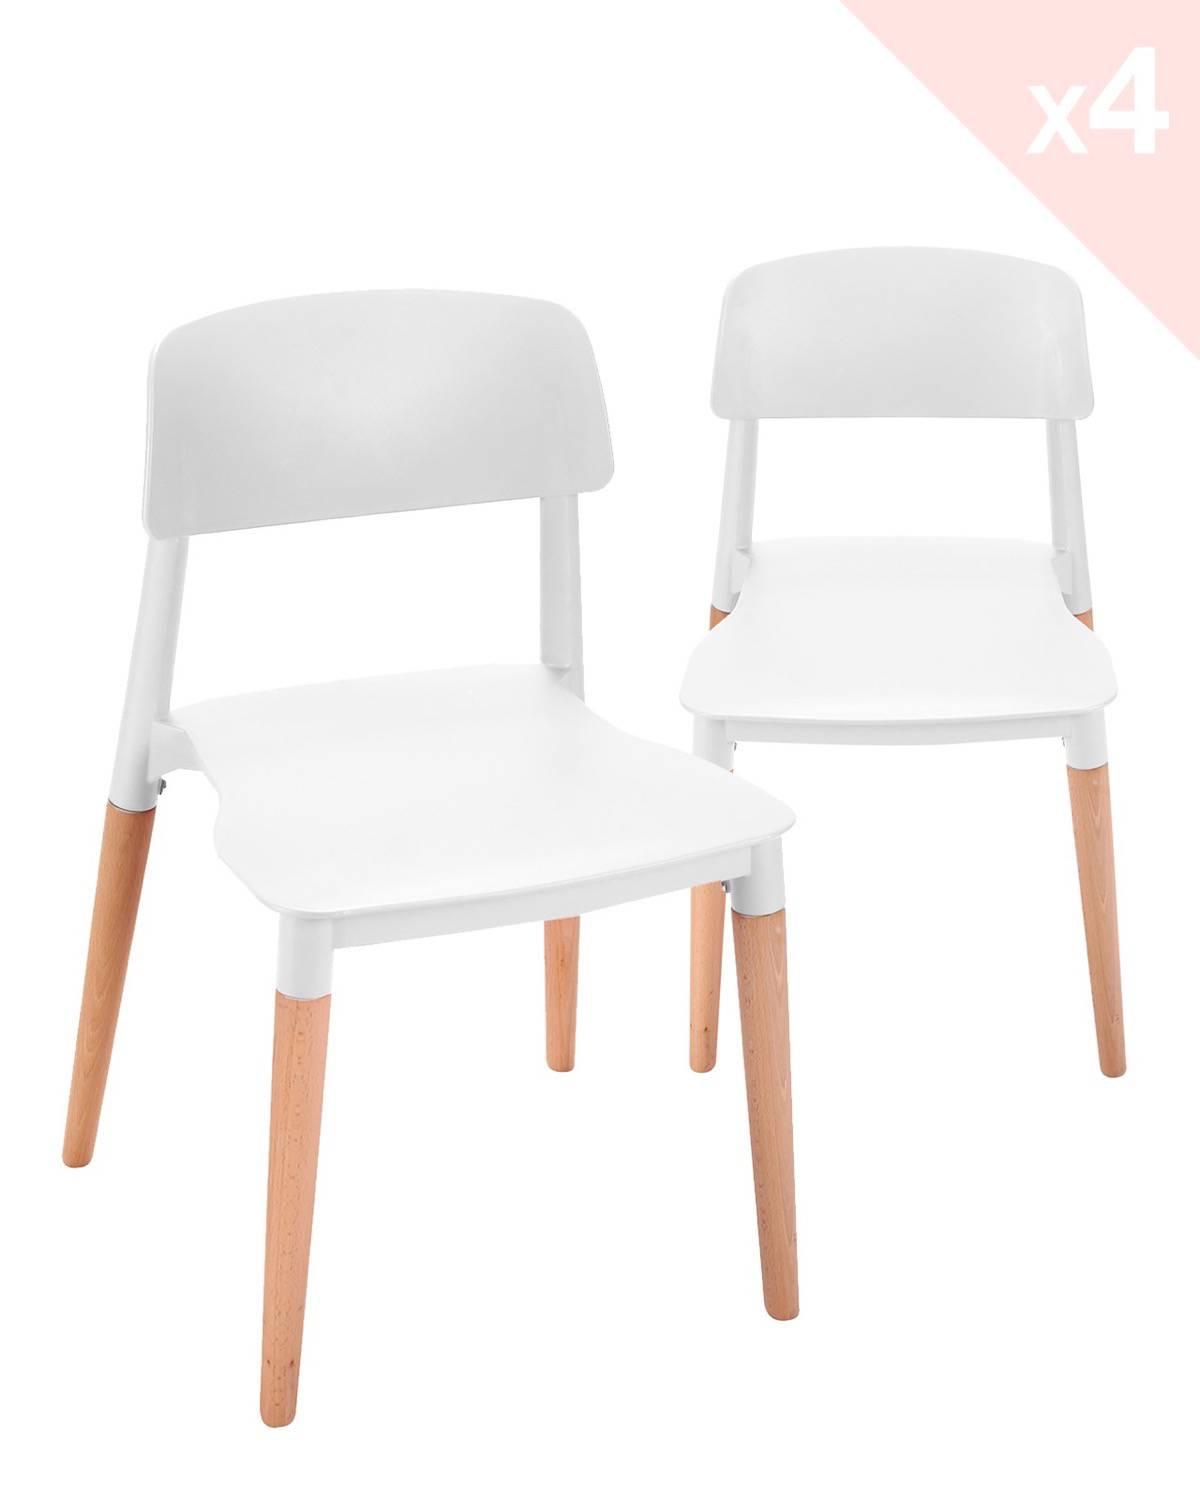 napa lot de 4 chaises cuisine design pi tement h tre. Black Bedroom Furniture Sets. Home Design Ideas